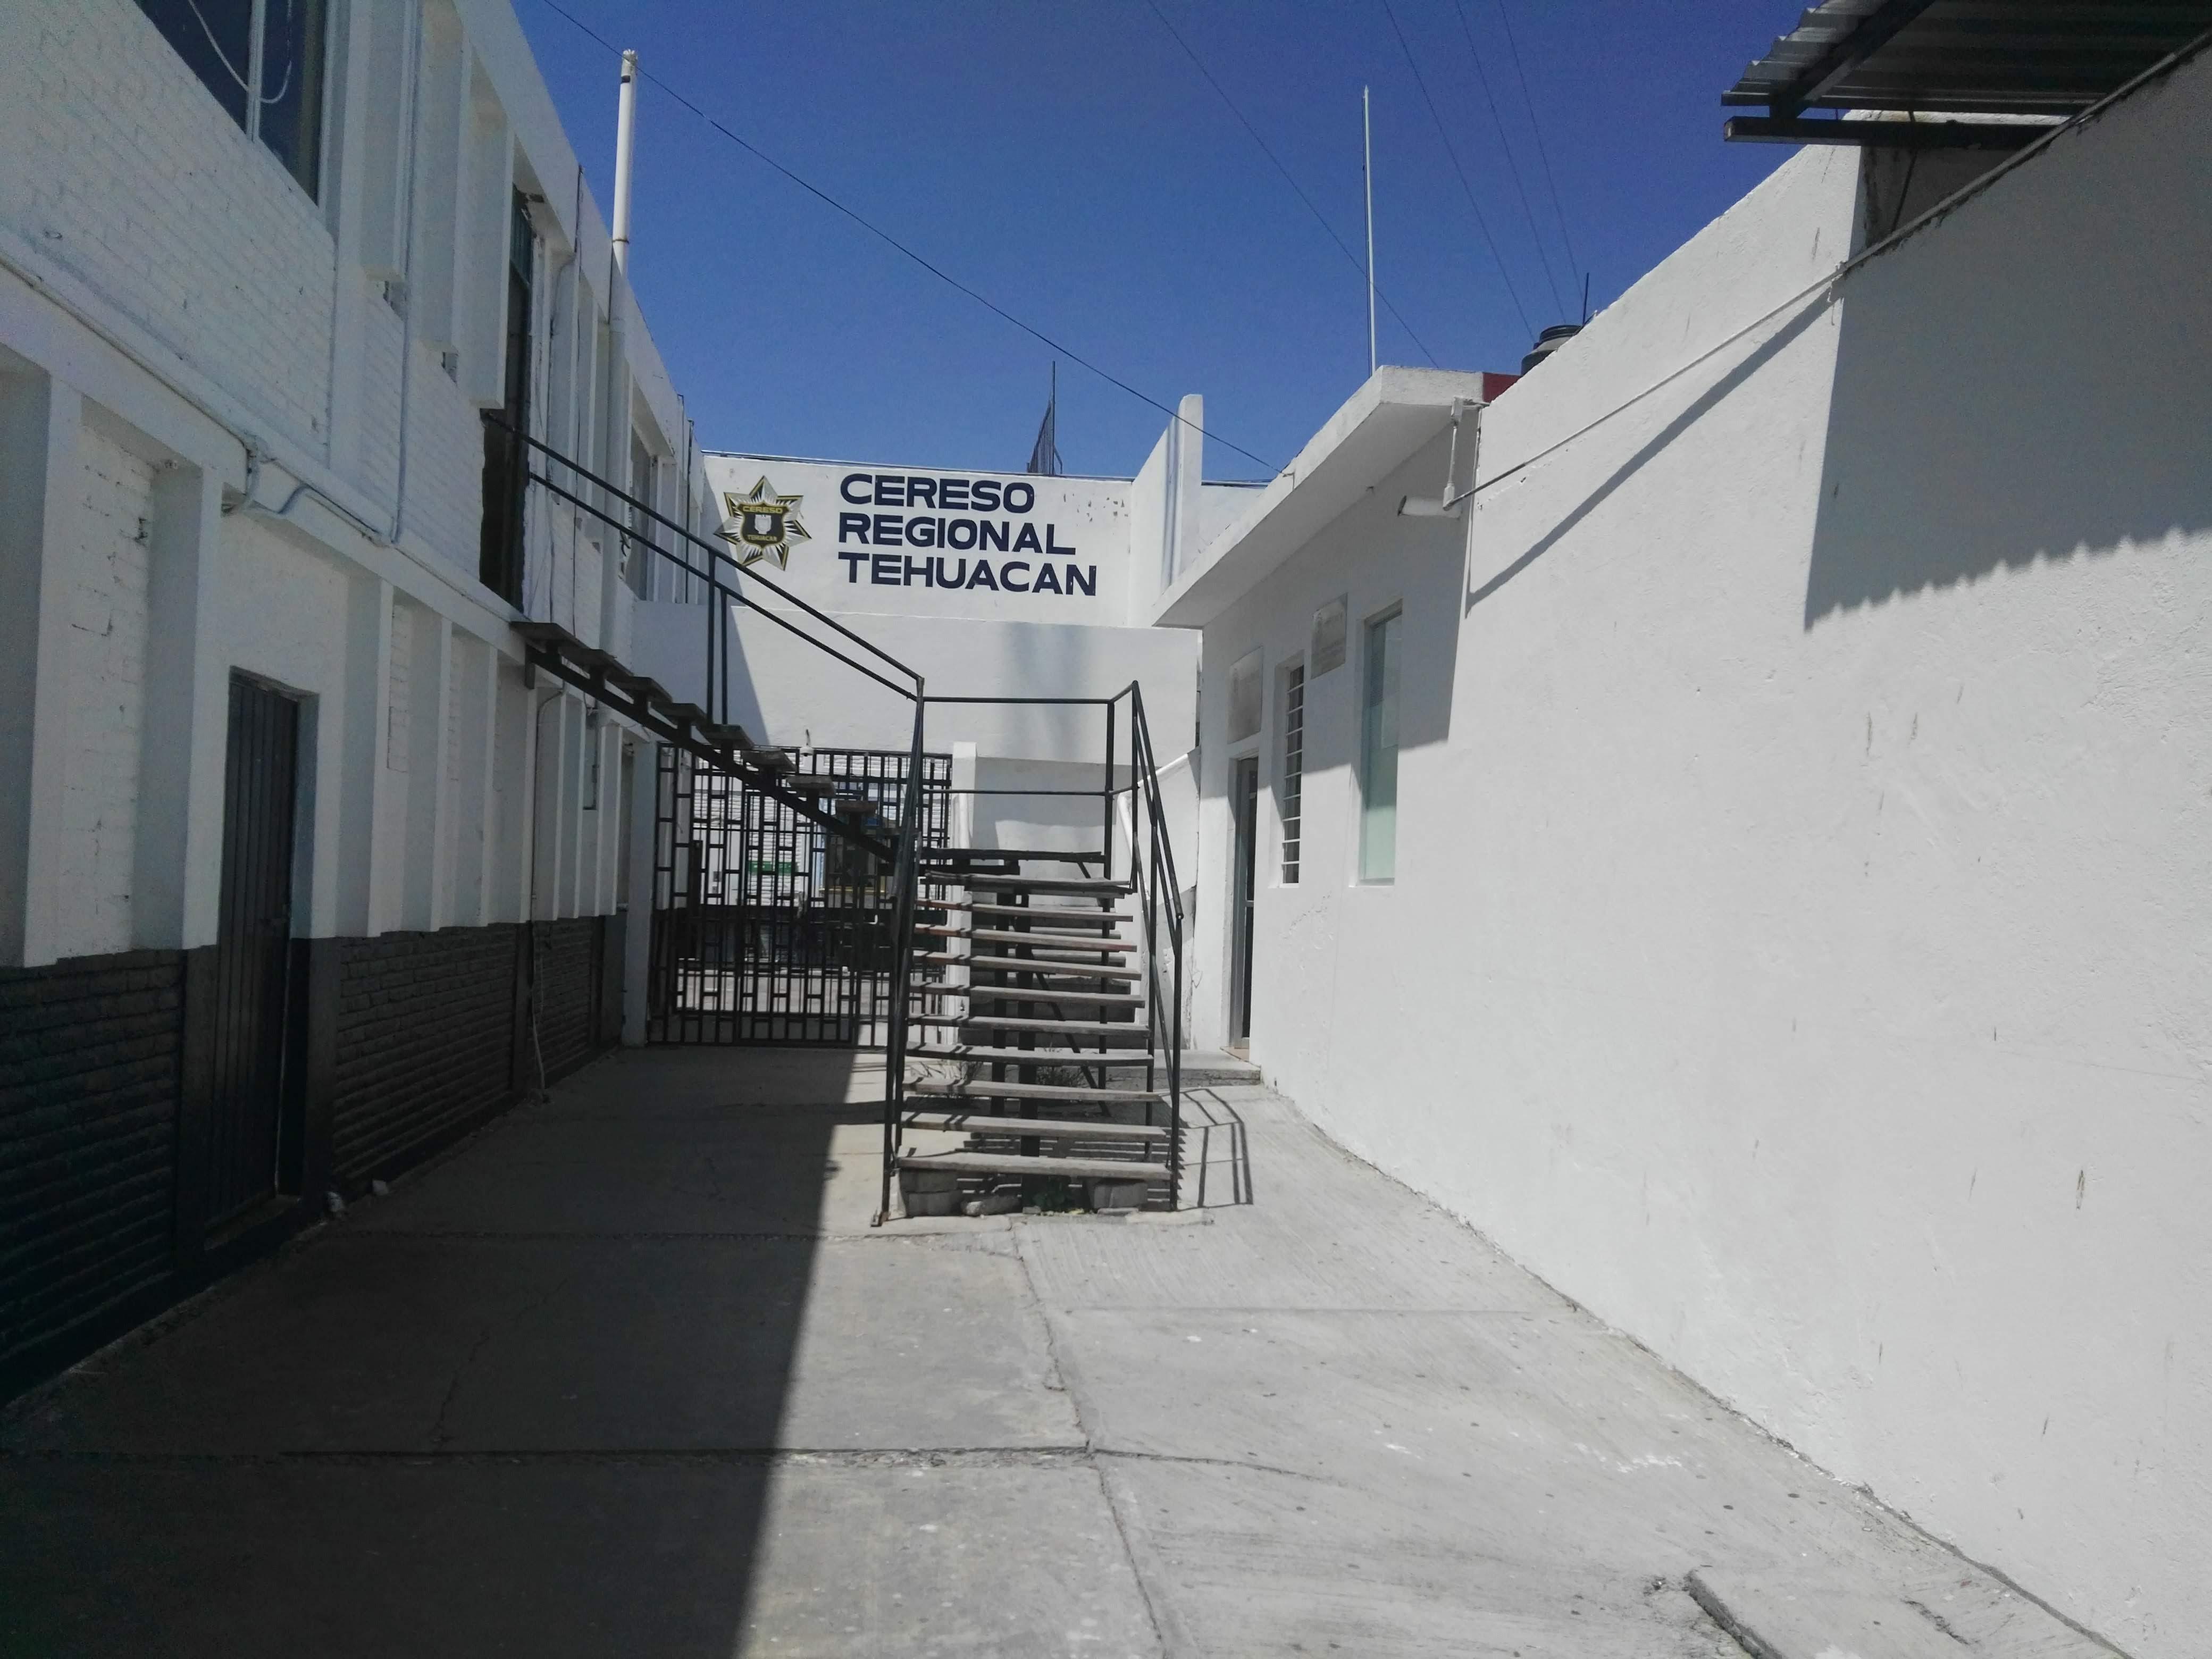 Descartan casos de coronavirus en el penal de Tehuacán